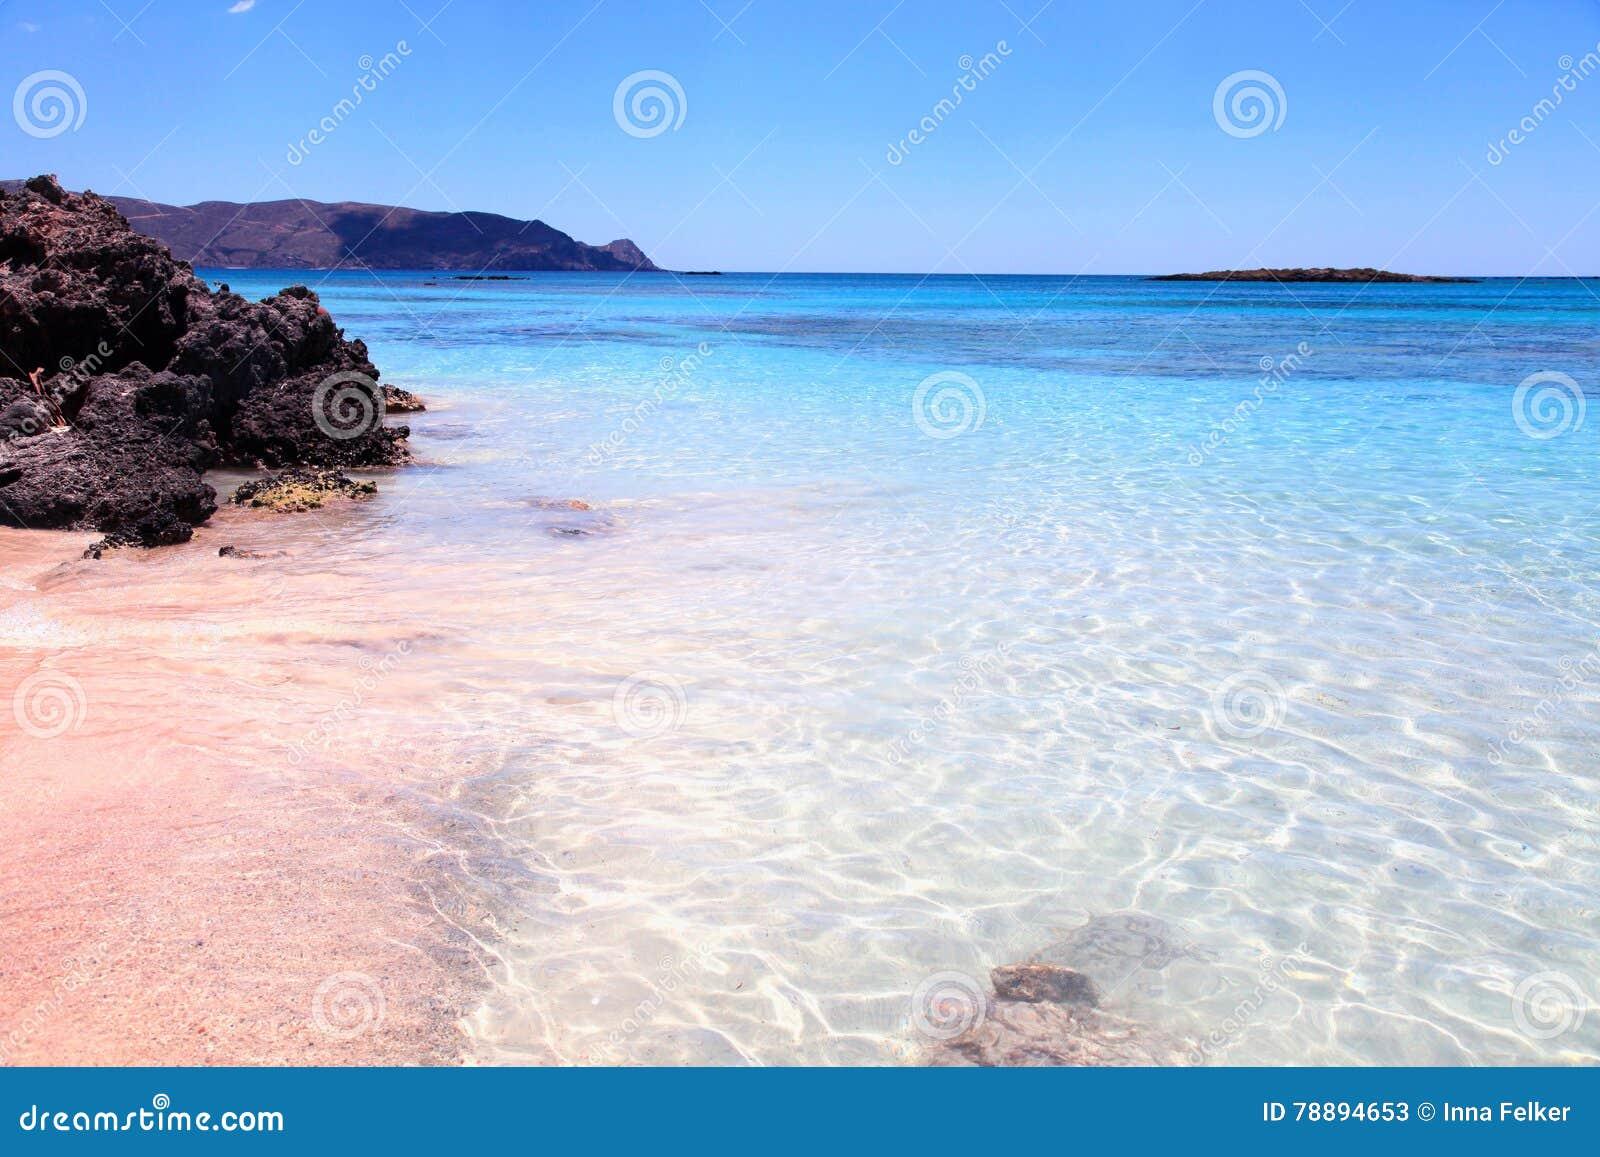 Pink Sand Beach Elafonisi, Crete Island, Greece. Stock ...